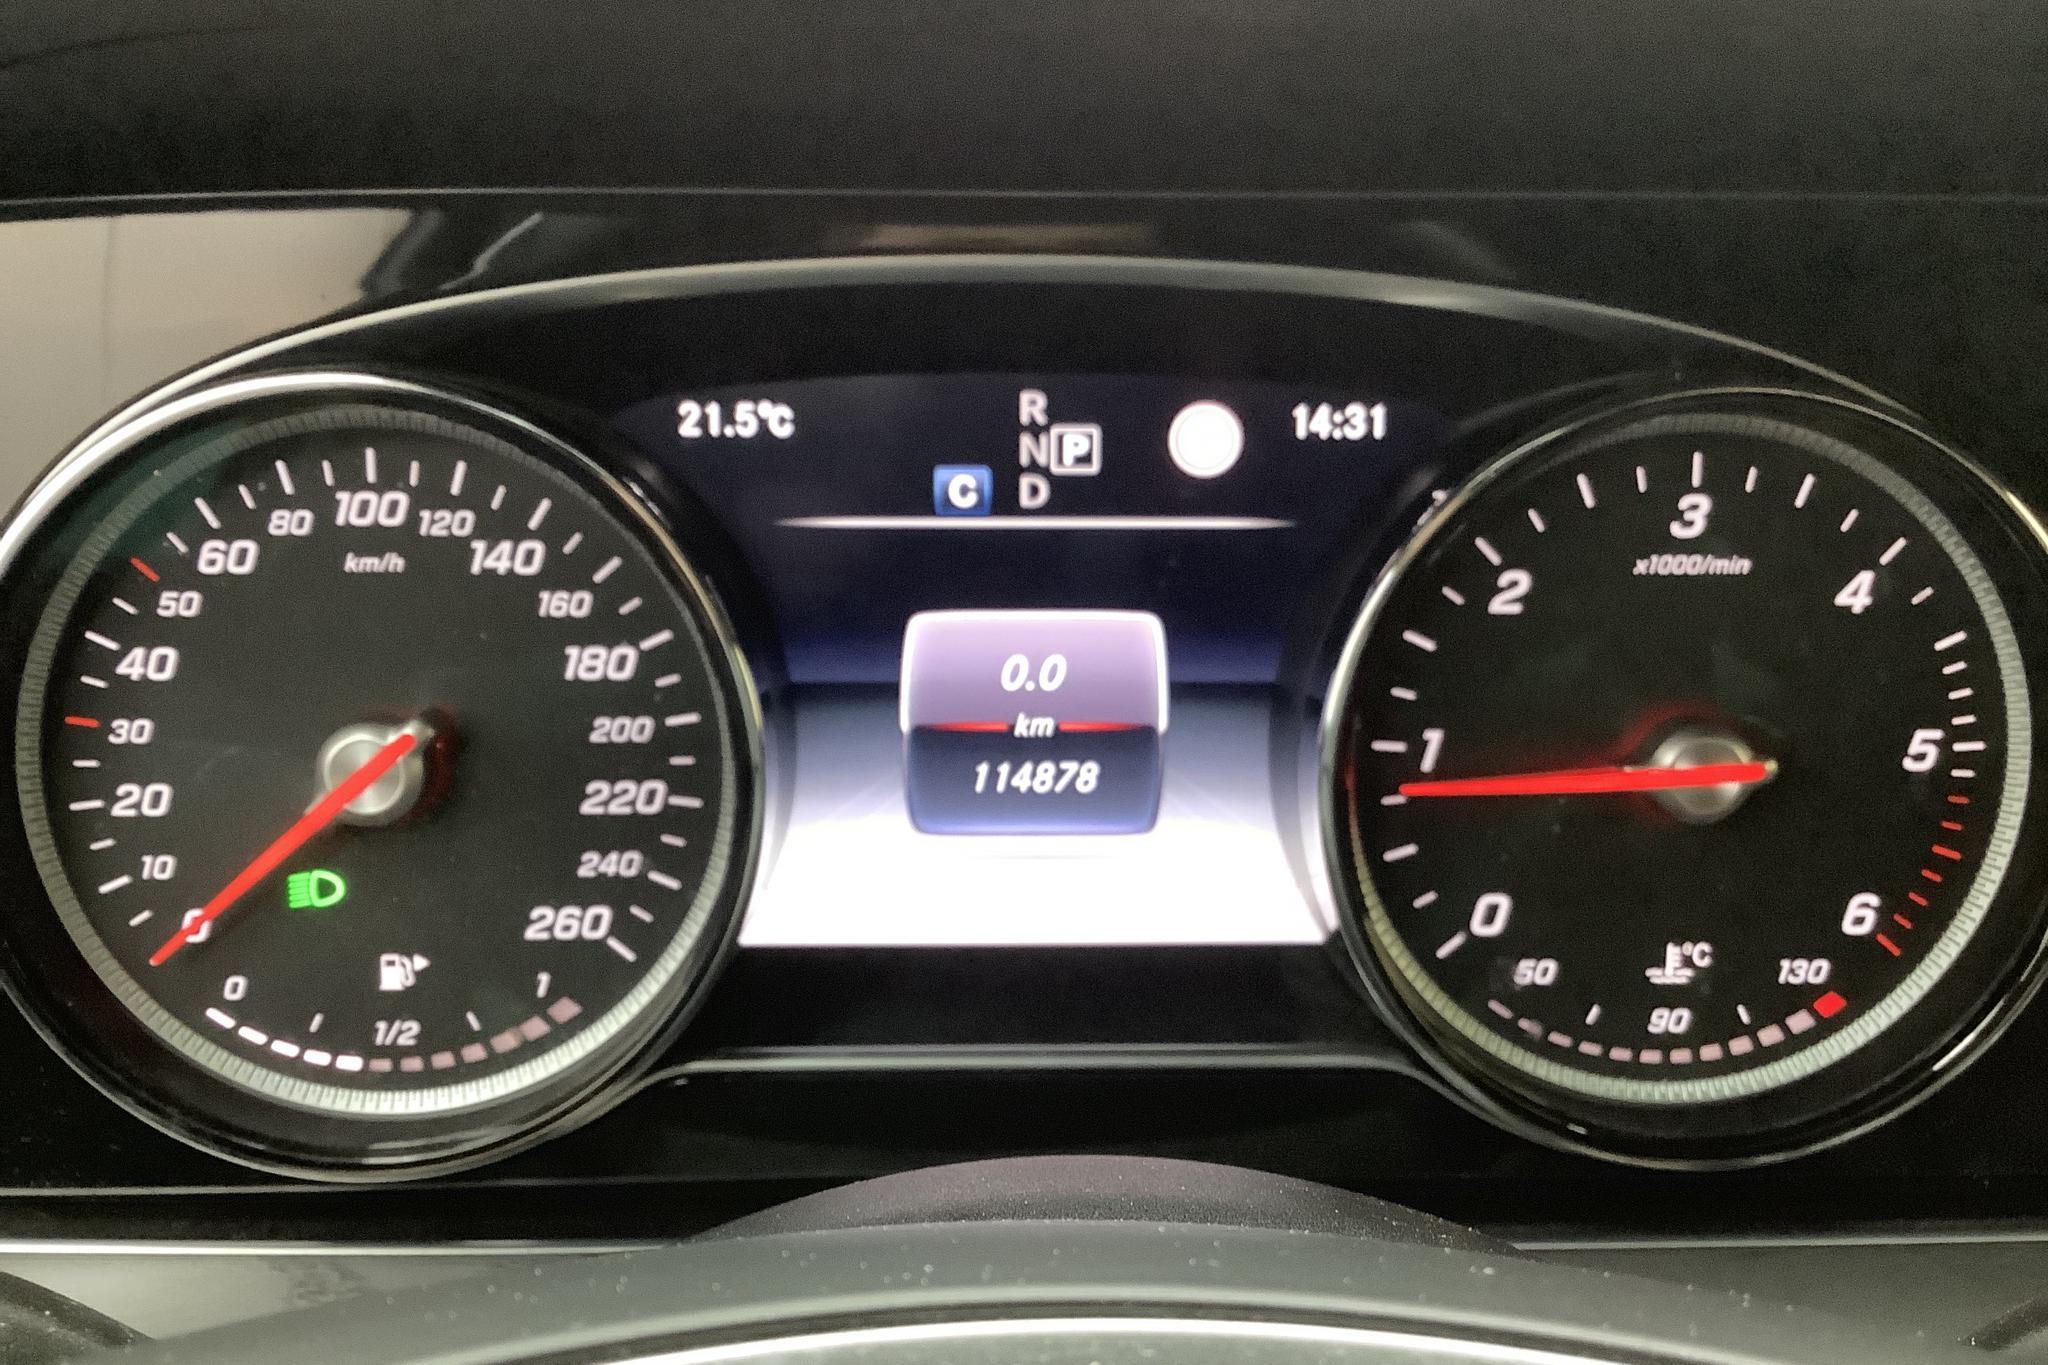 Mercedes E 220 d 4MATIC Kombi S213 (194hk) - 114 880 km - Automatic - Dark Brown - 2018